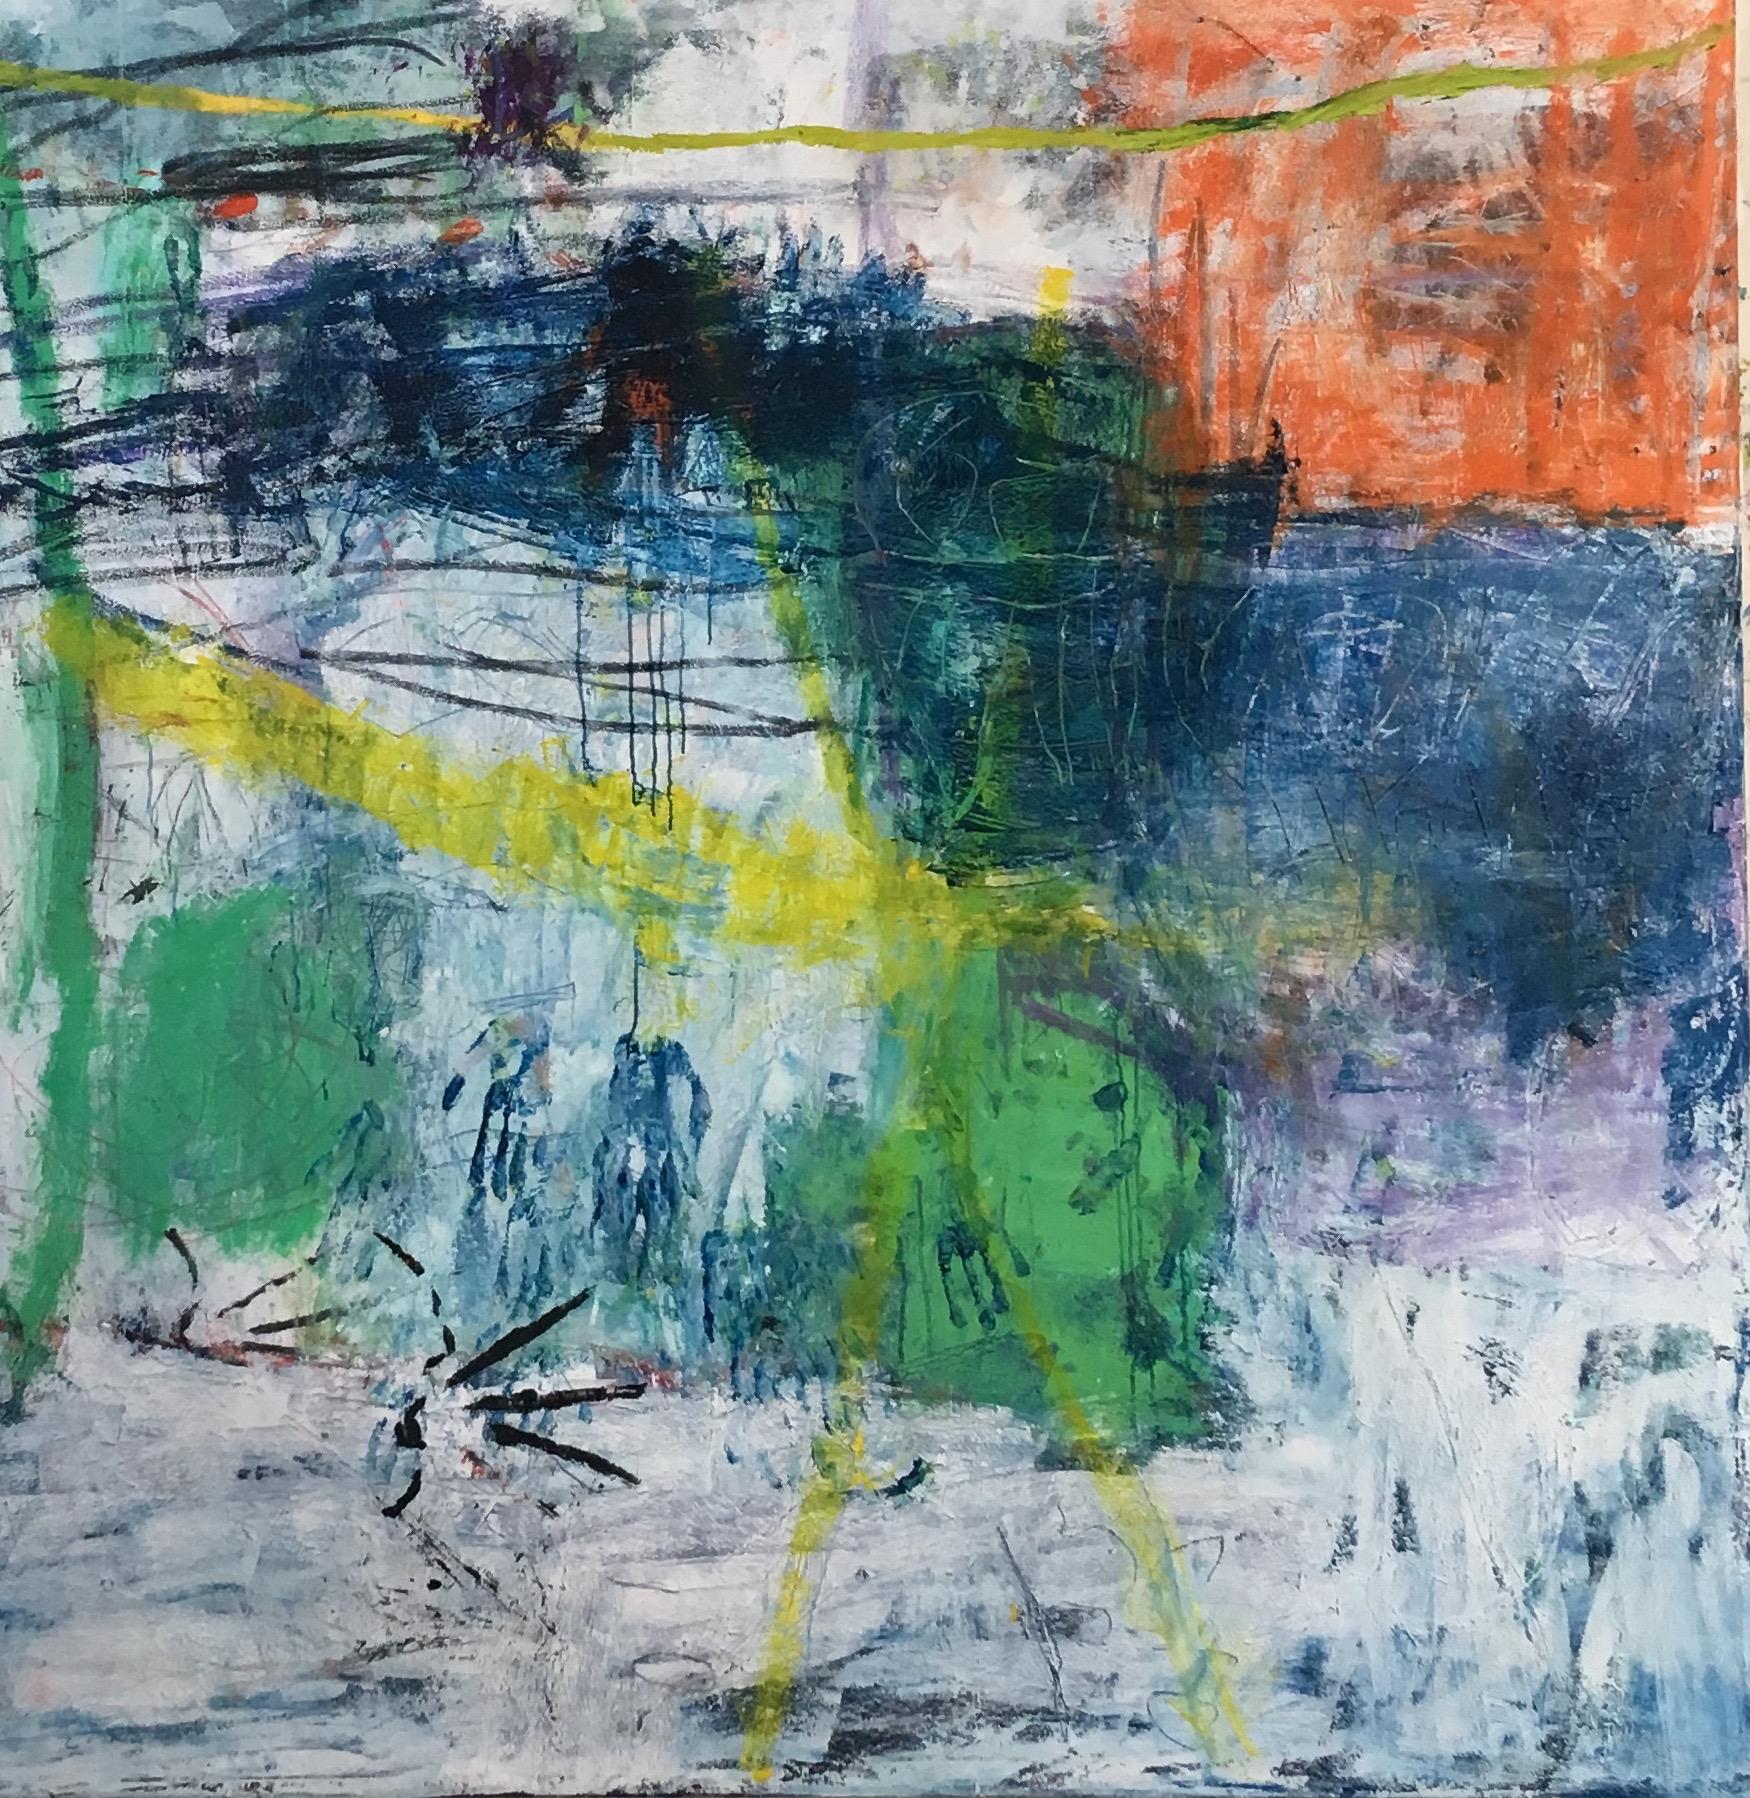 Scrape 72x72 in oil on canvas 2019